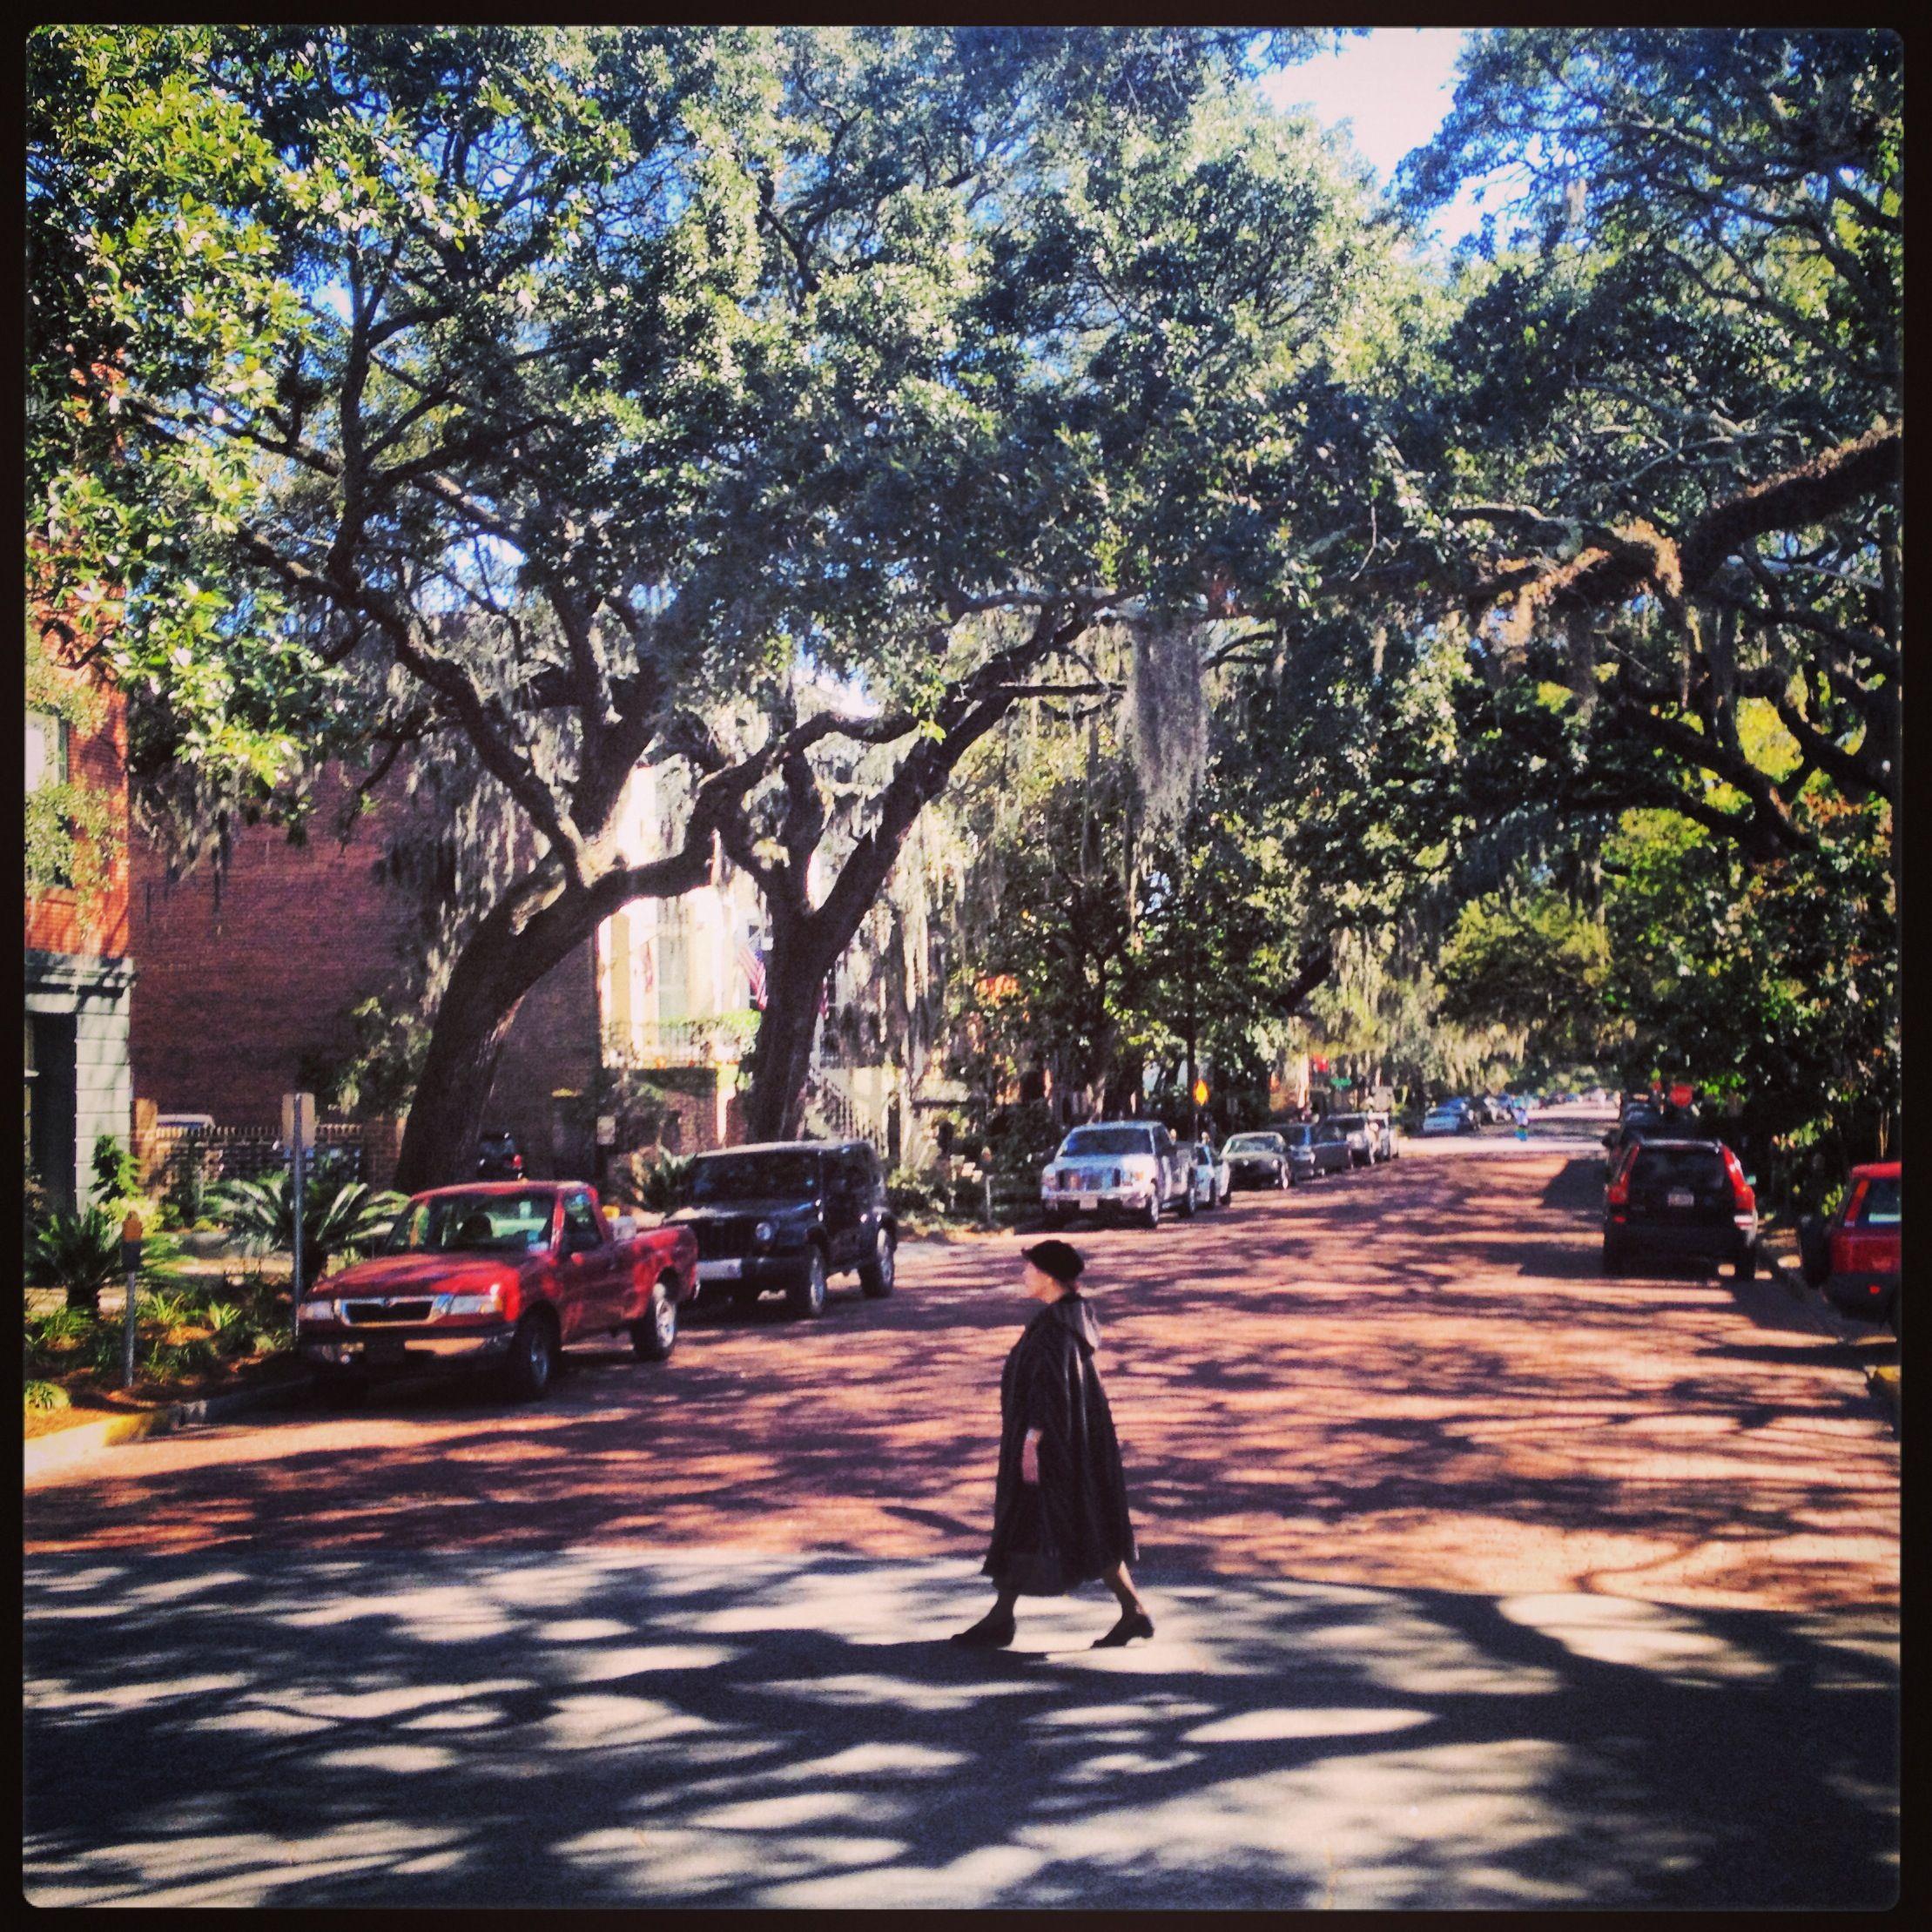 Southern Belle - Savannah GA